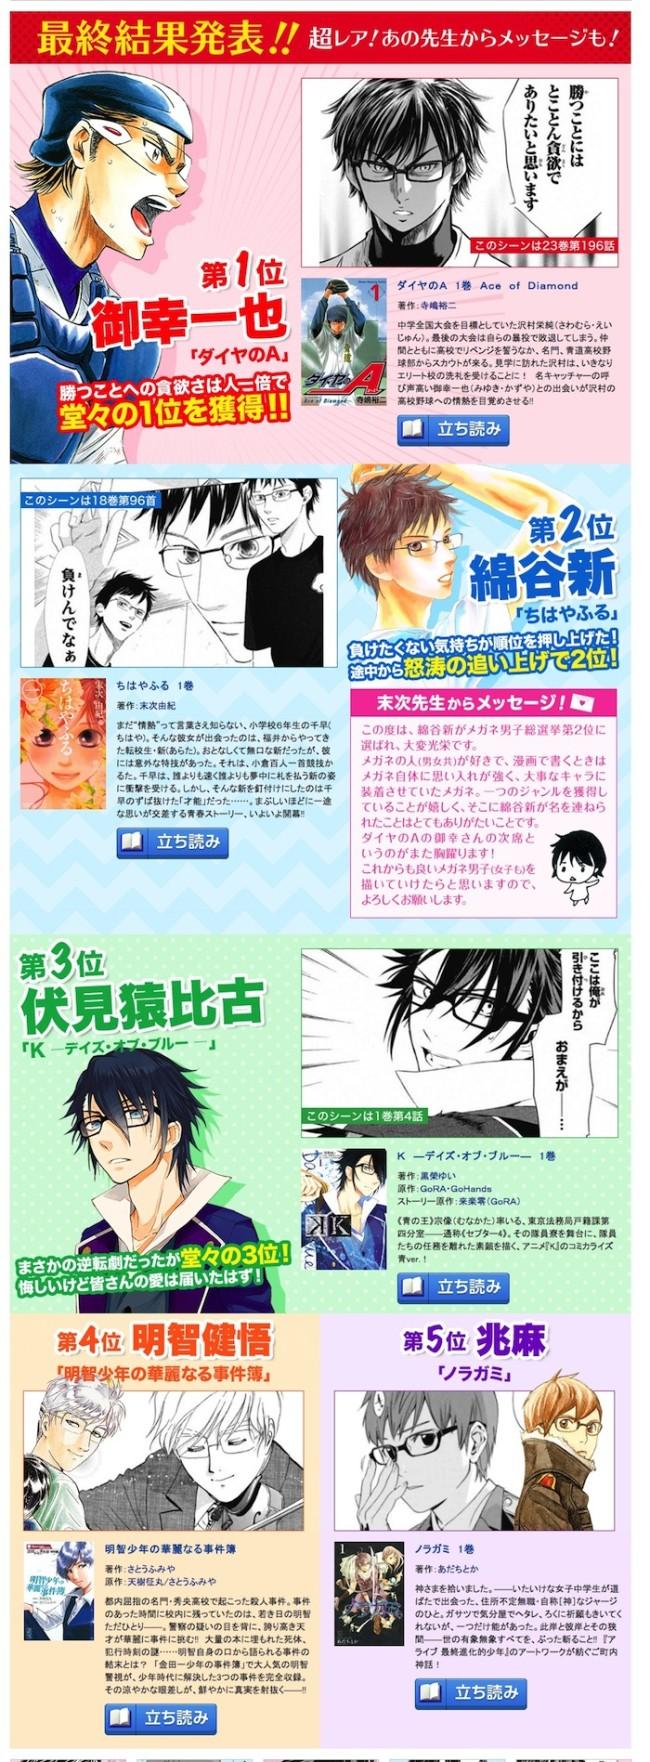 screencapture-bookstore-yahoo-co-jp-promo-special-koudansha-201411_vote-html (1) のコピー